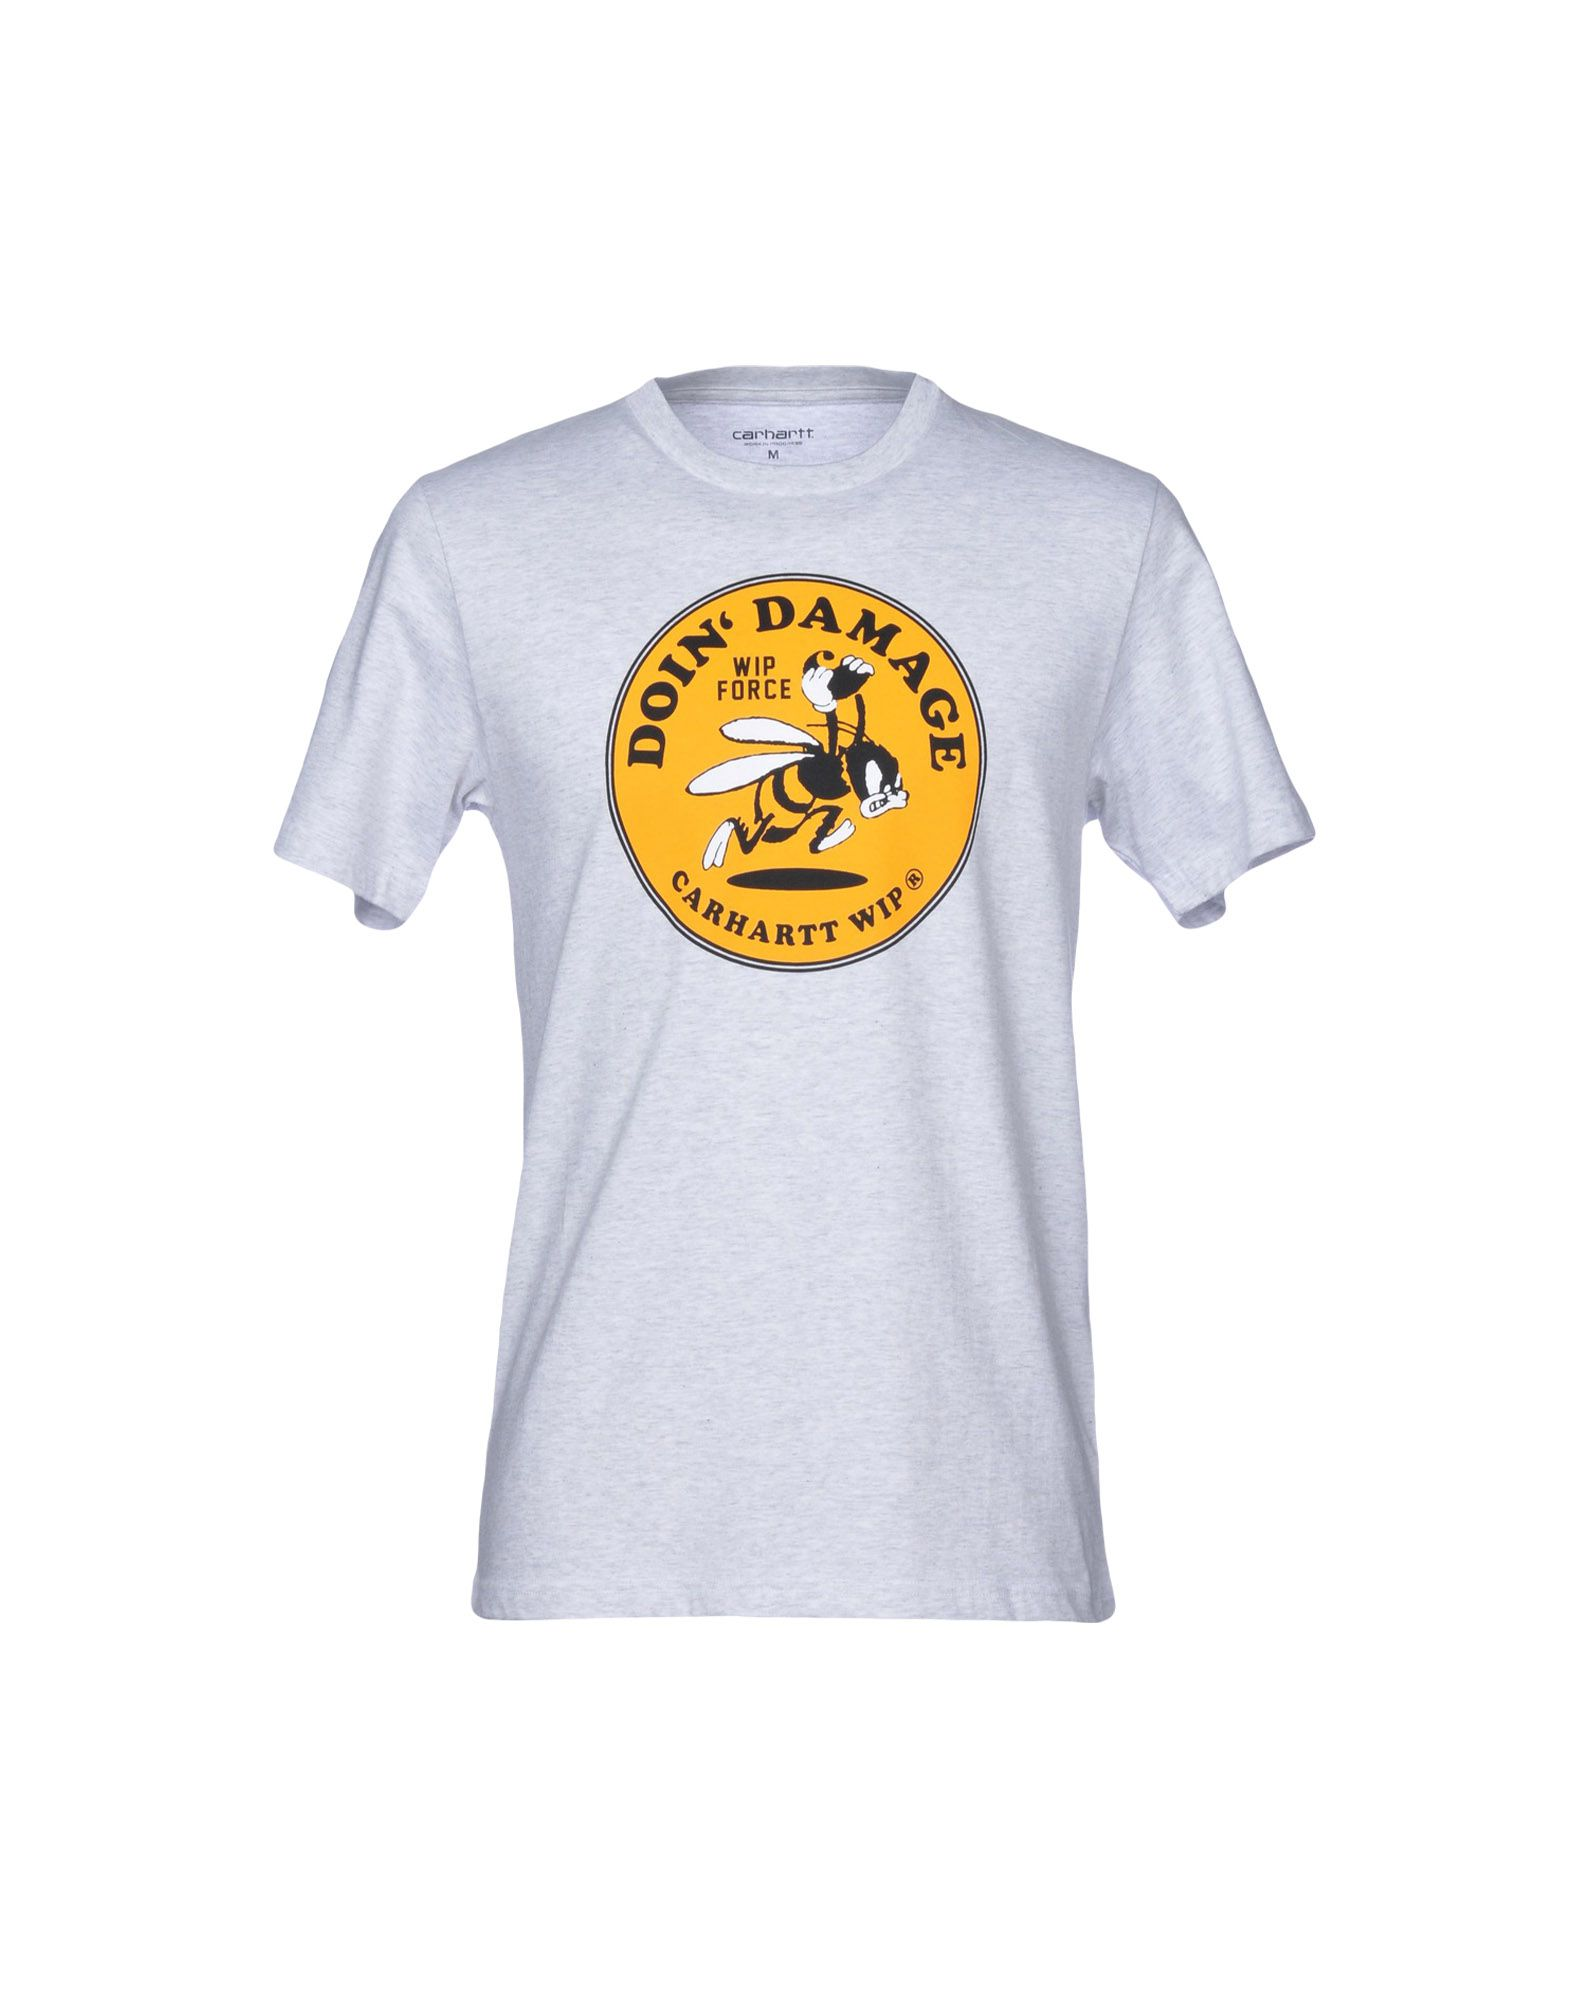 CARHARTT Футболка футболка carhartt wip i018486 white camo tiger laurel